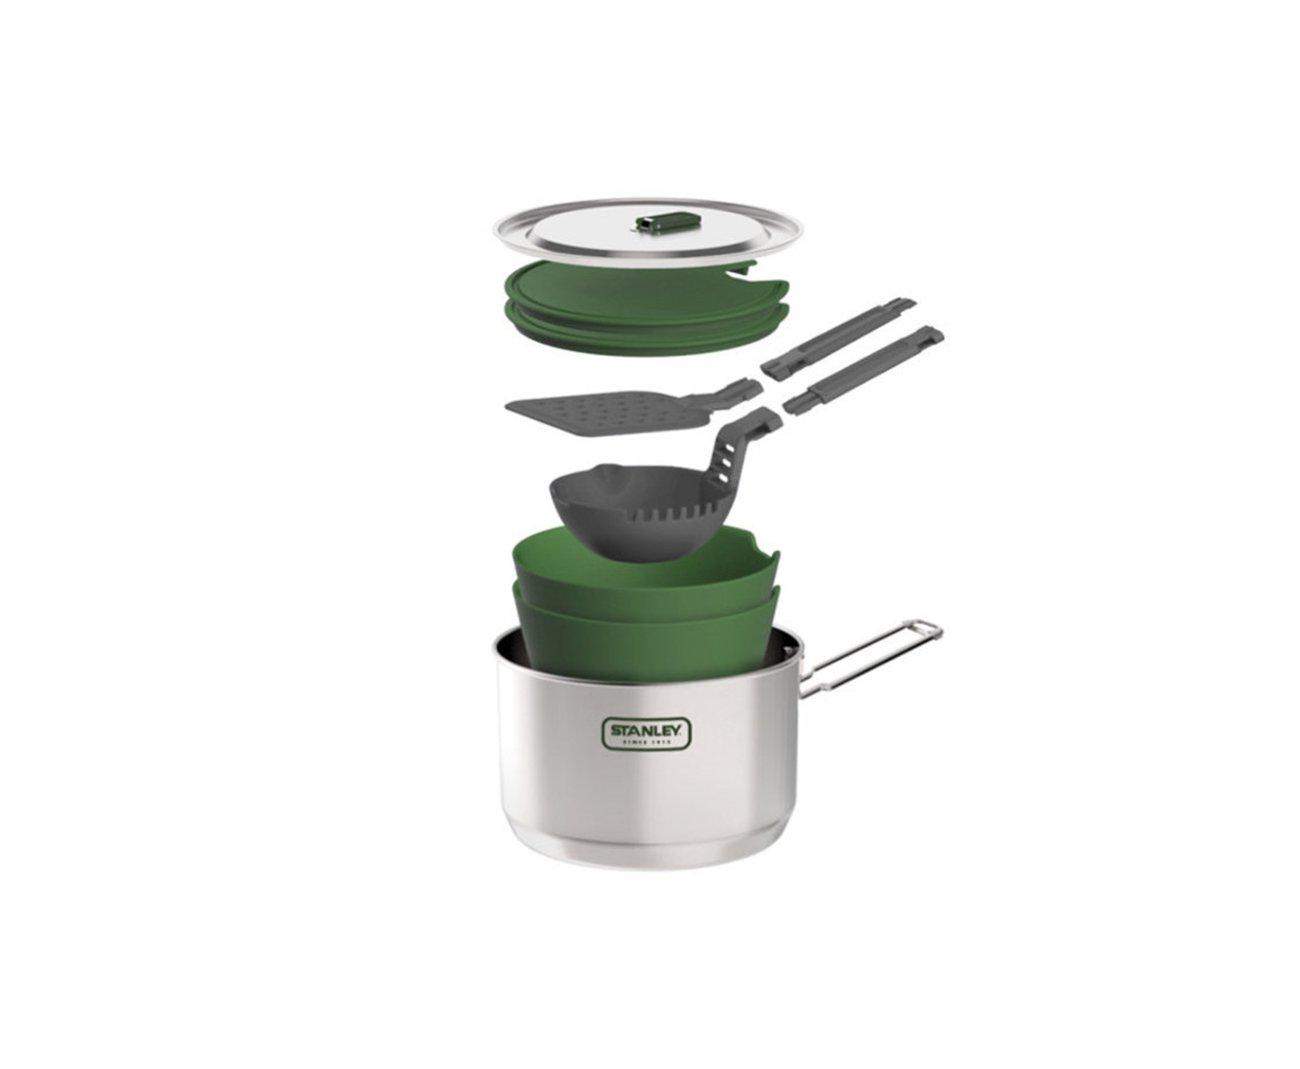 Kit Prep & Cook 10 Peças Stainless Steel 1.50l - Stanley